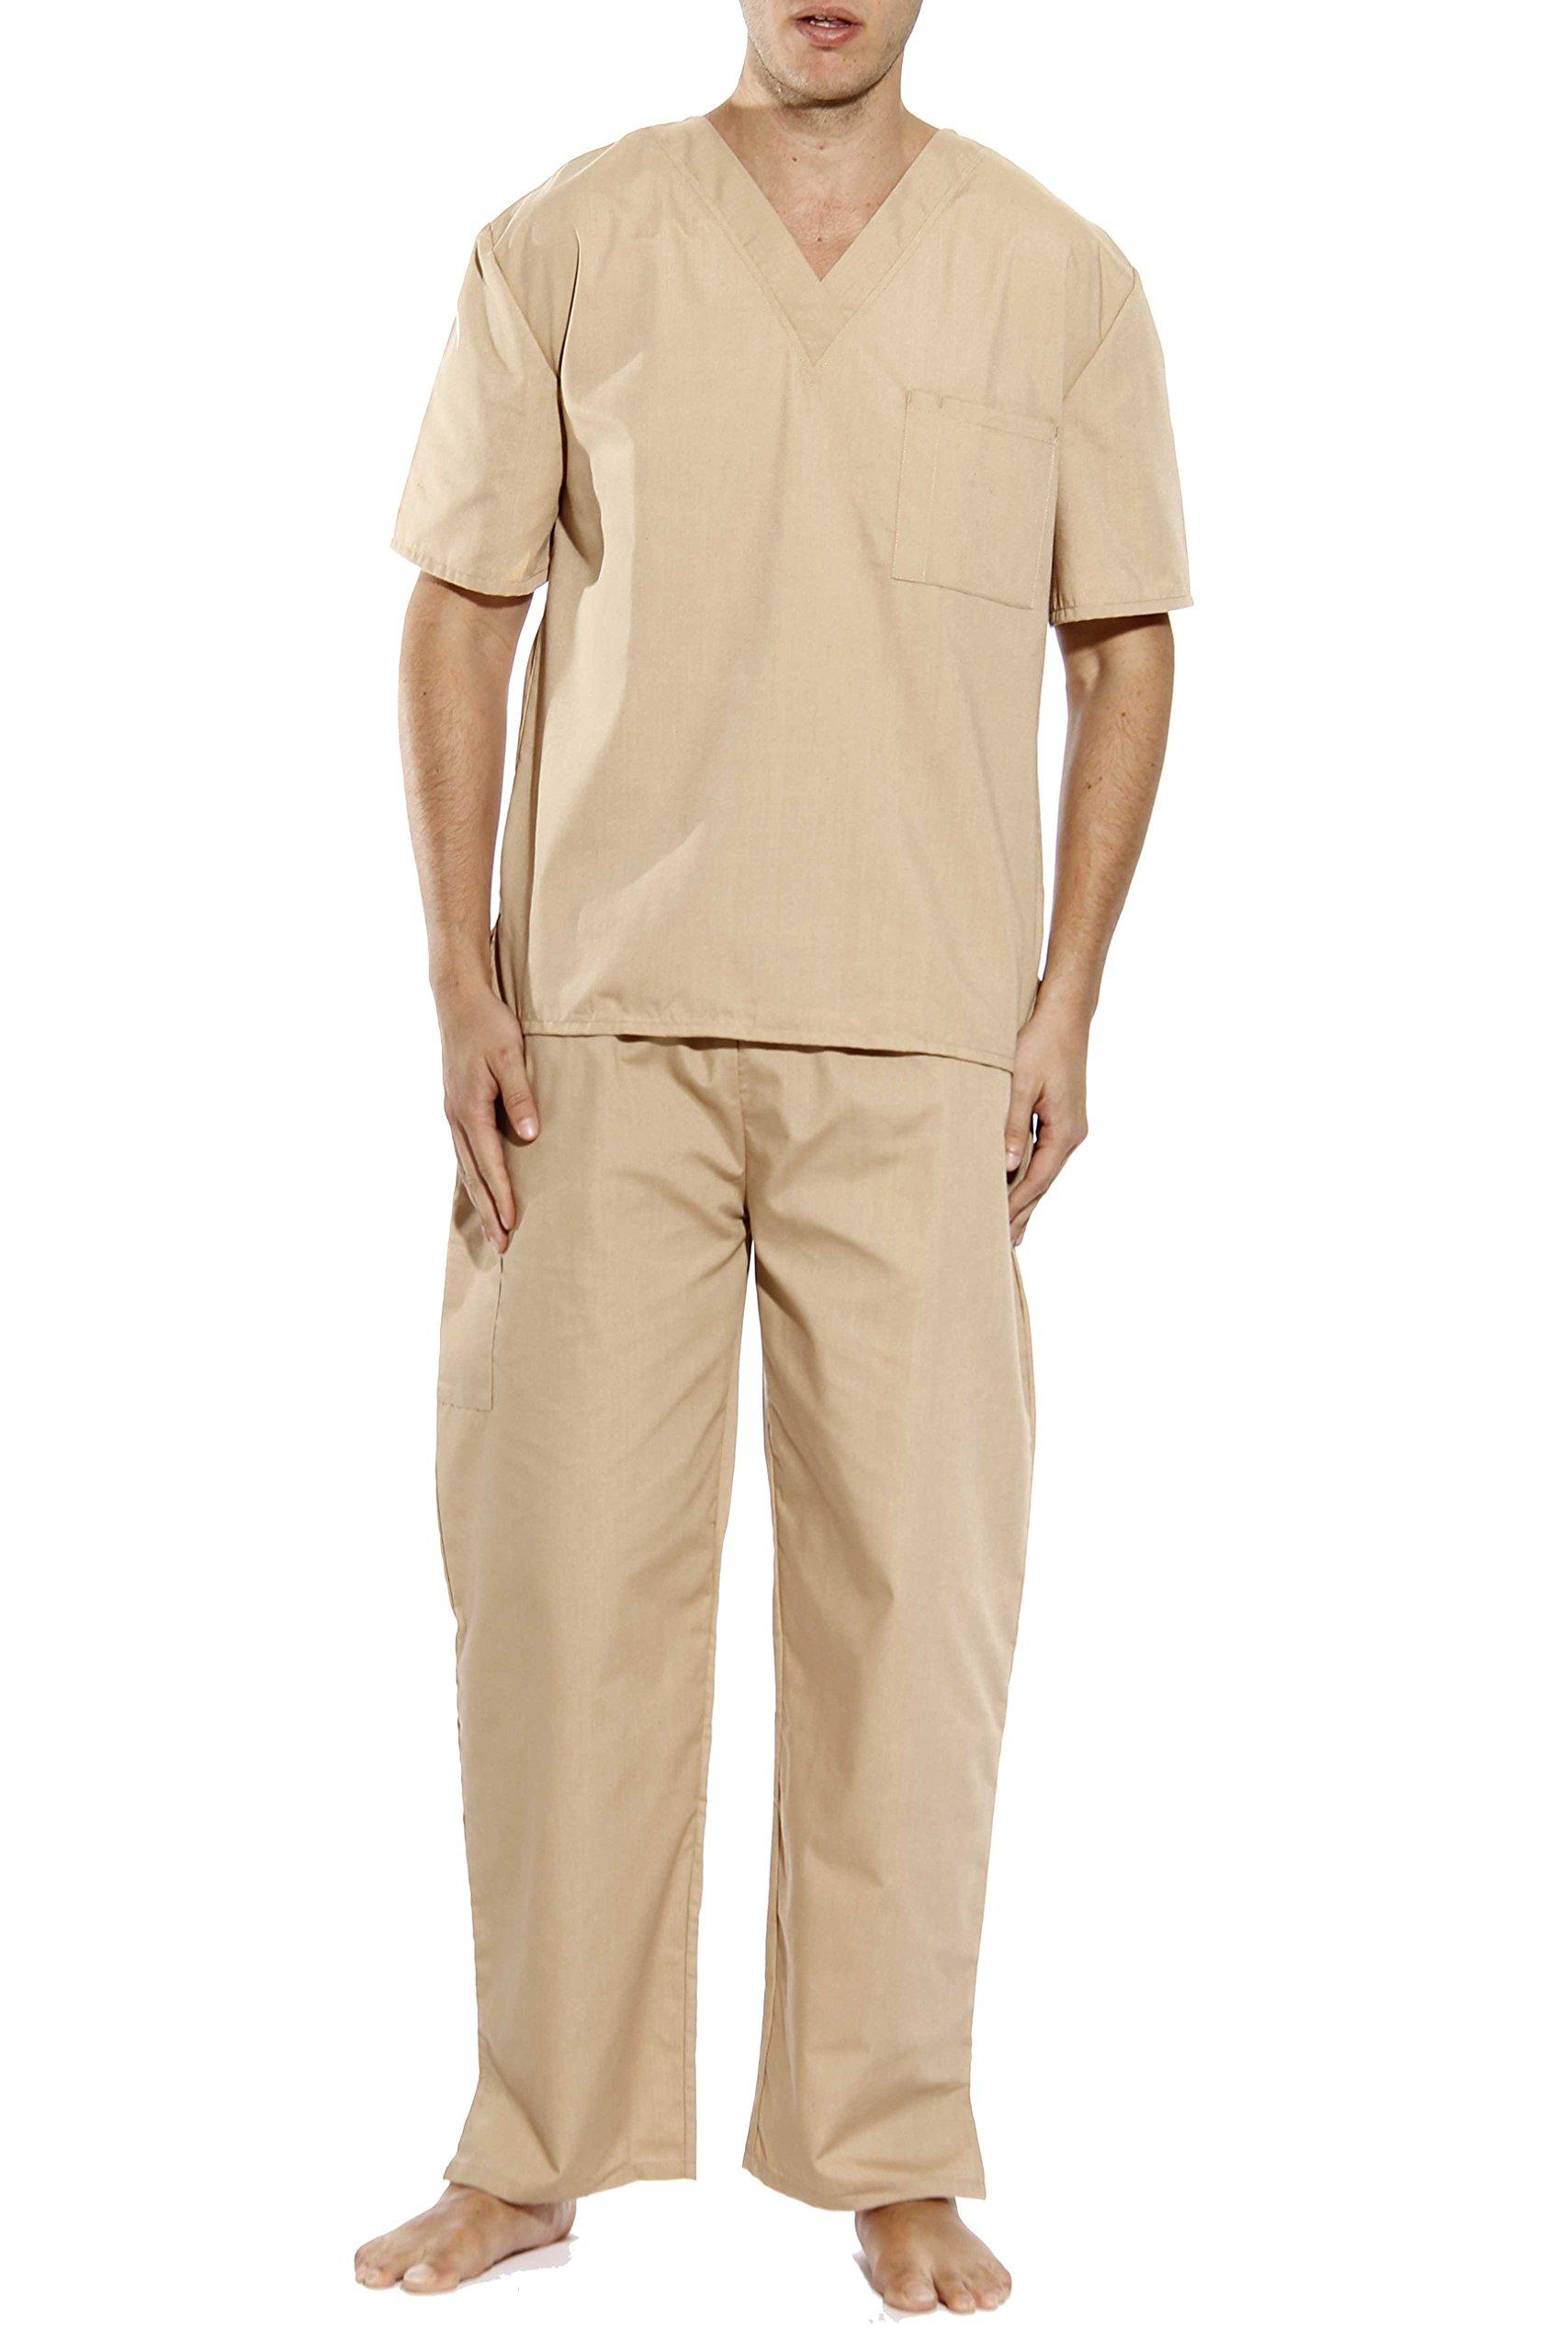 33000M-Khaki-XXL Tropi Unisex Scrub Sets / Medical Scrubs / Nursing Scrubs